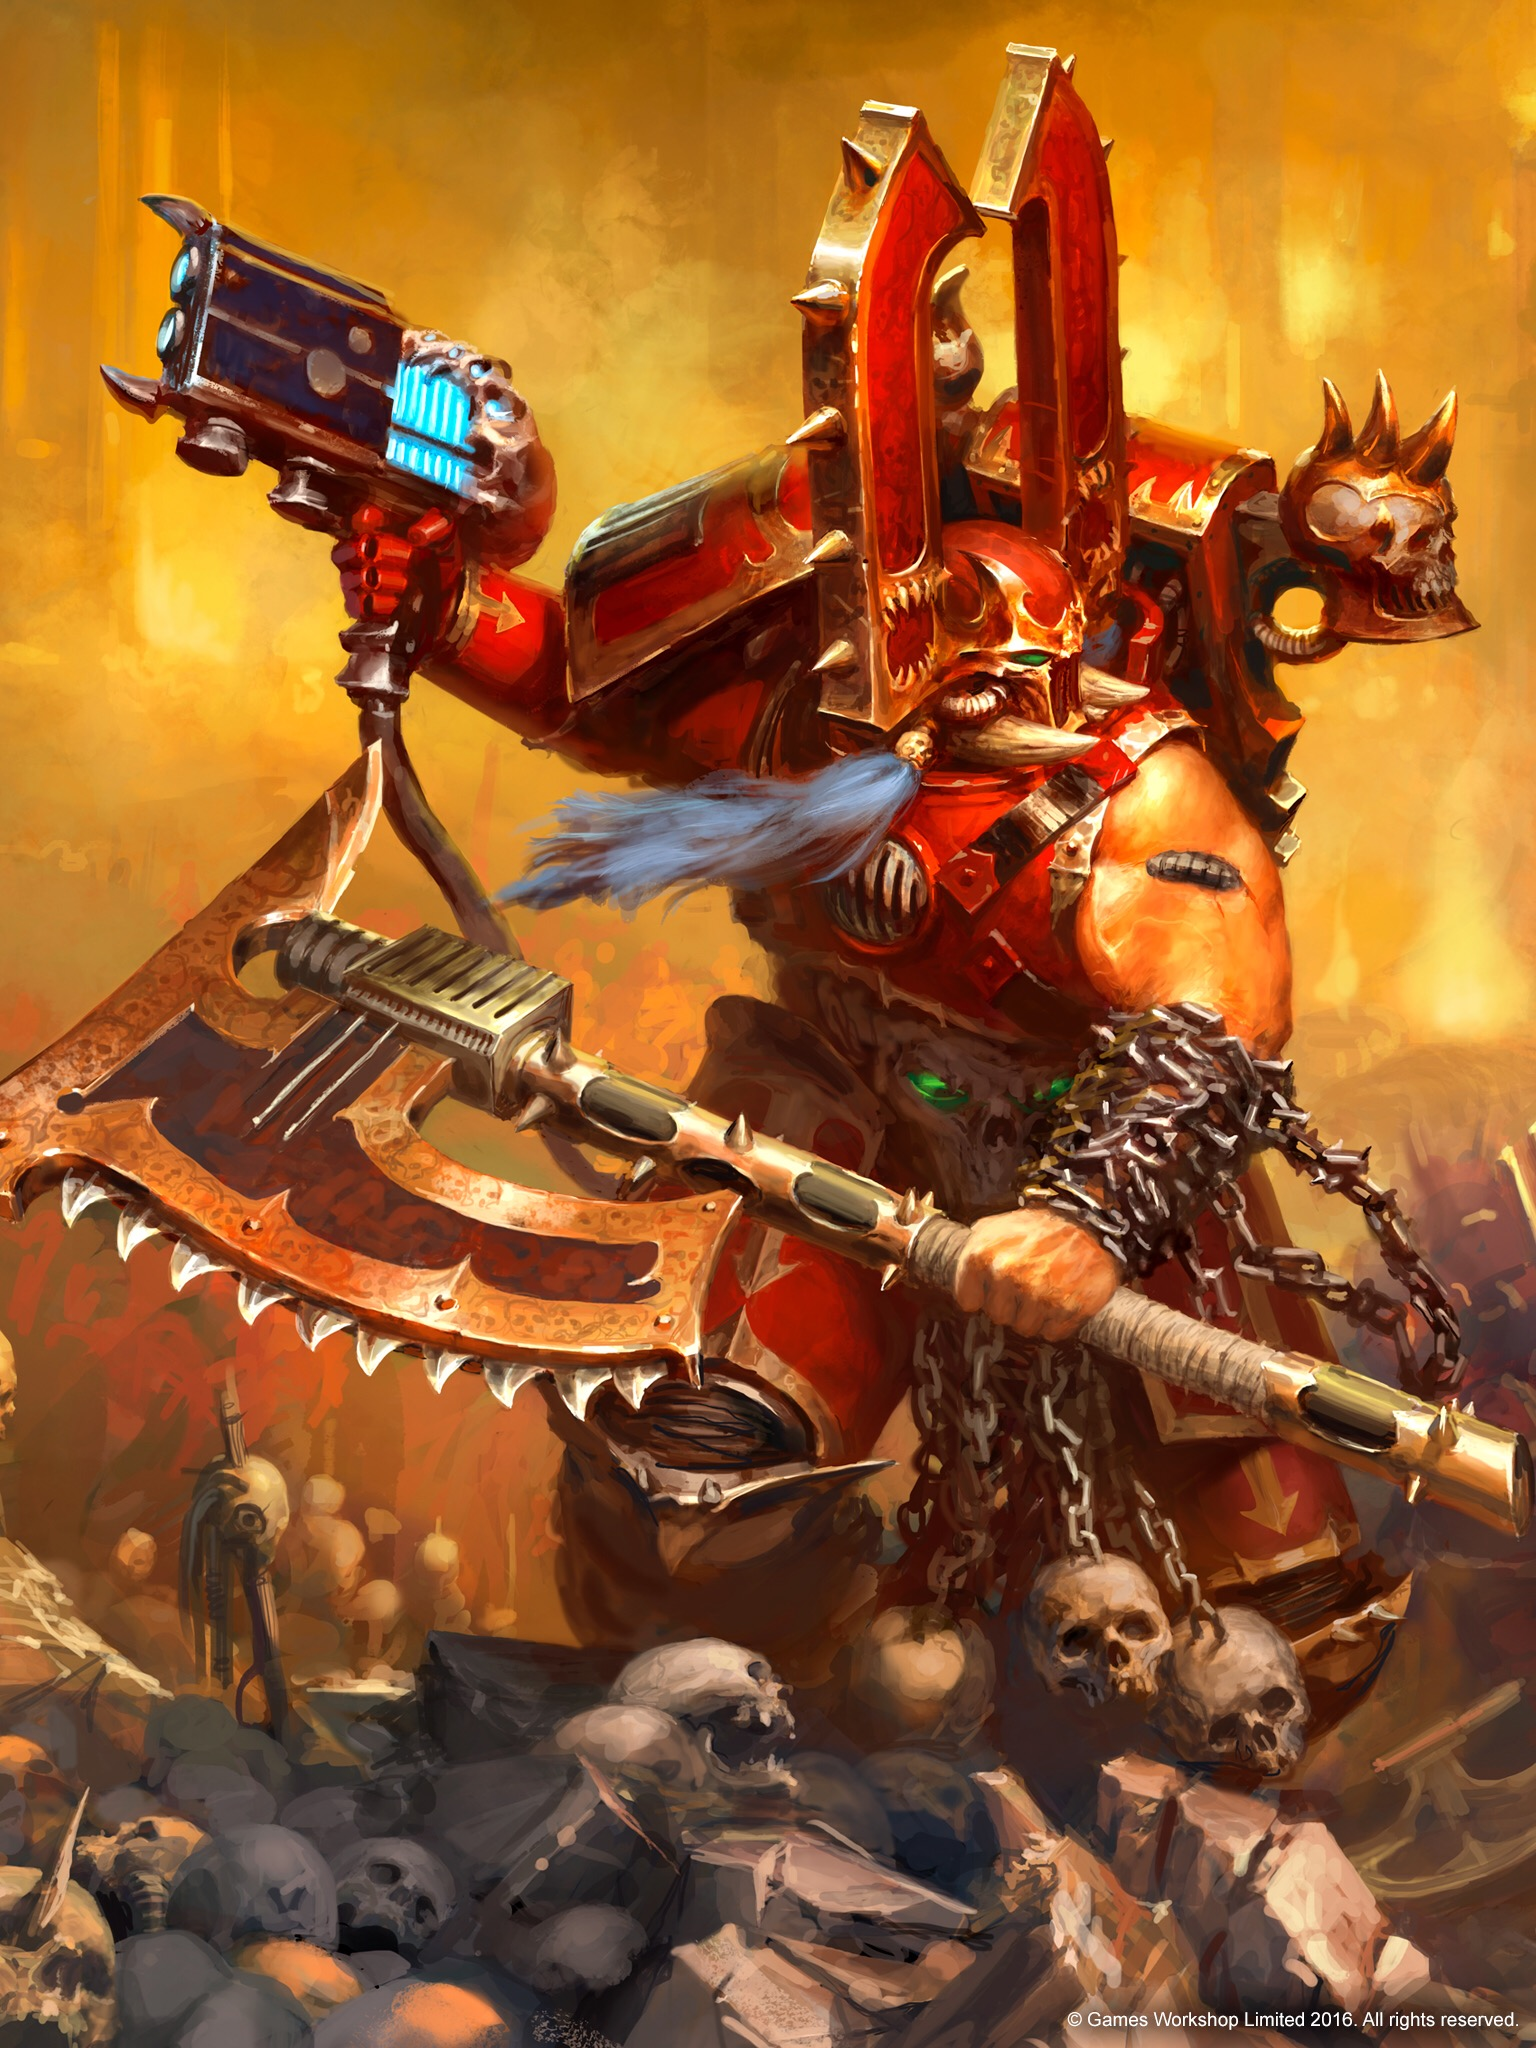 Warhammer 40K Chaos Space Marine KHARN THE BETRAYER Khorne Champion New